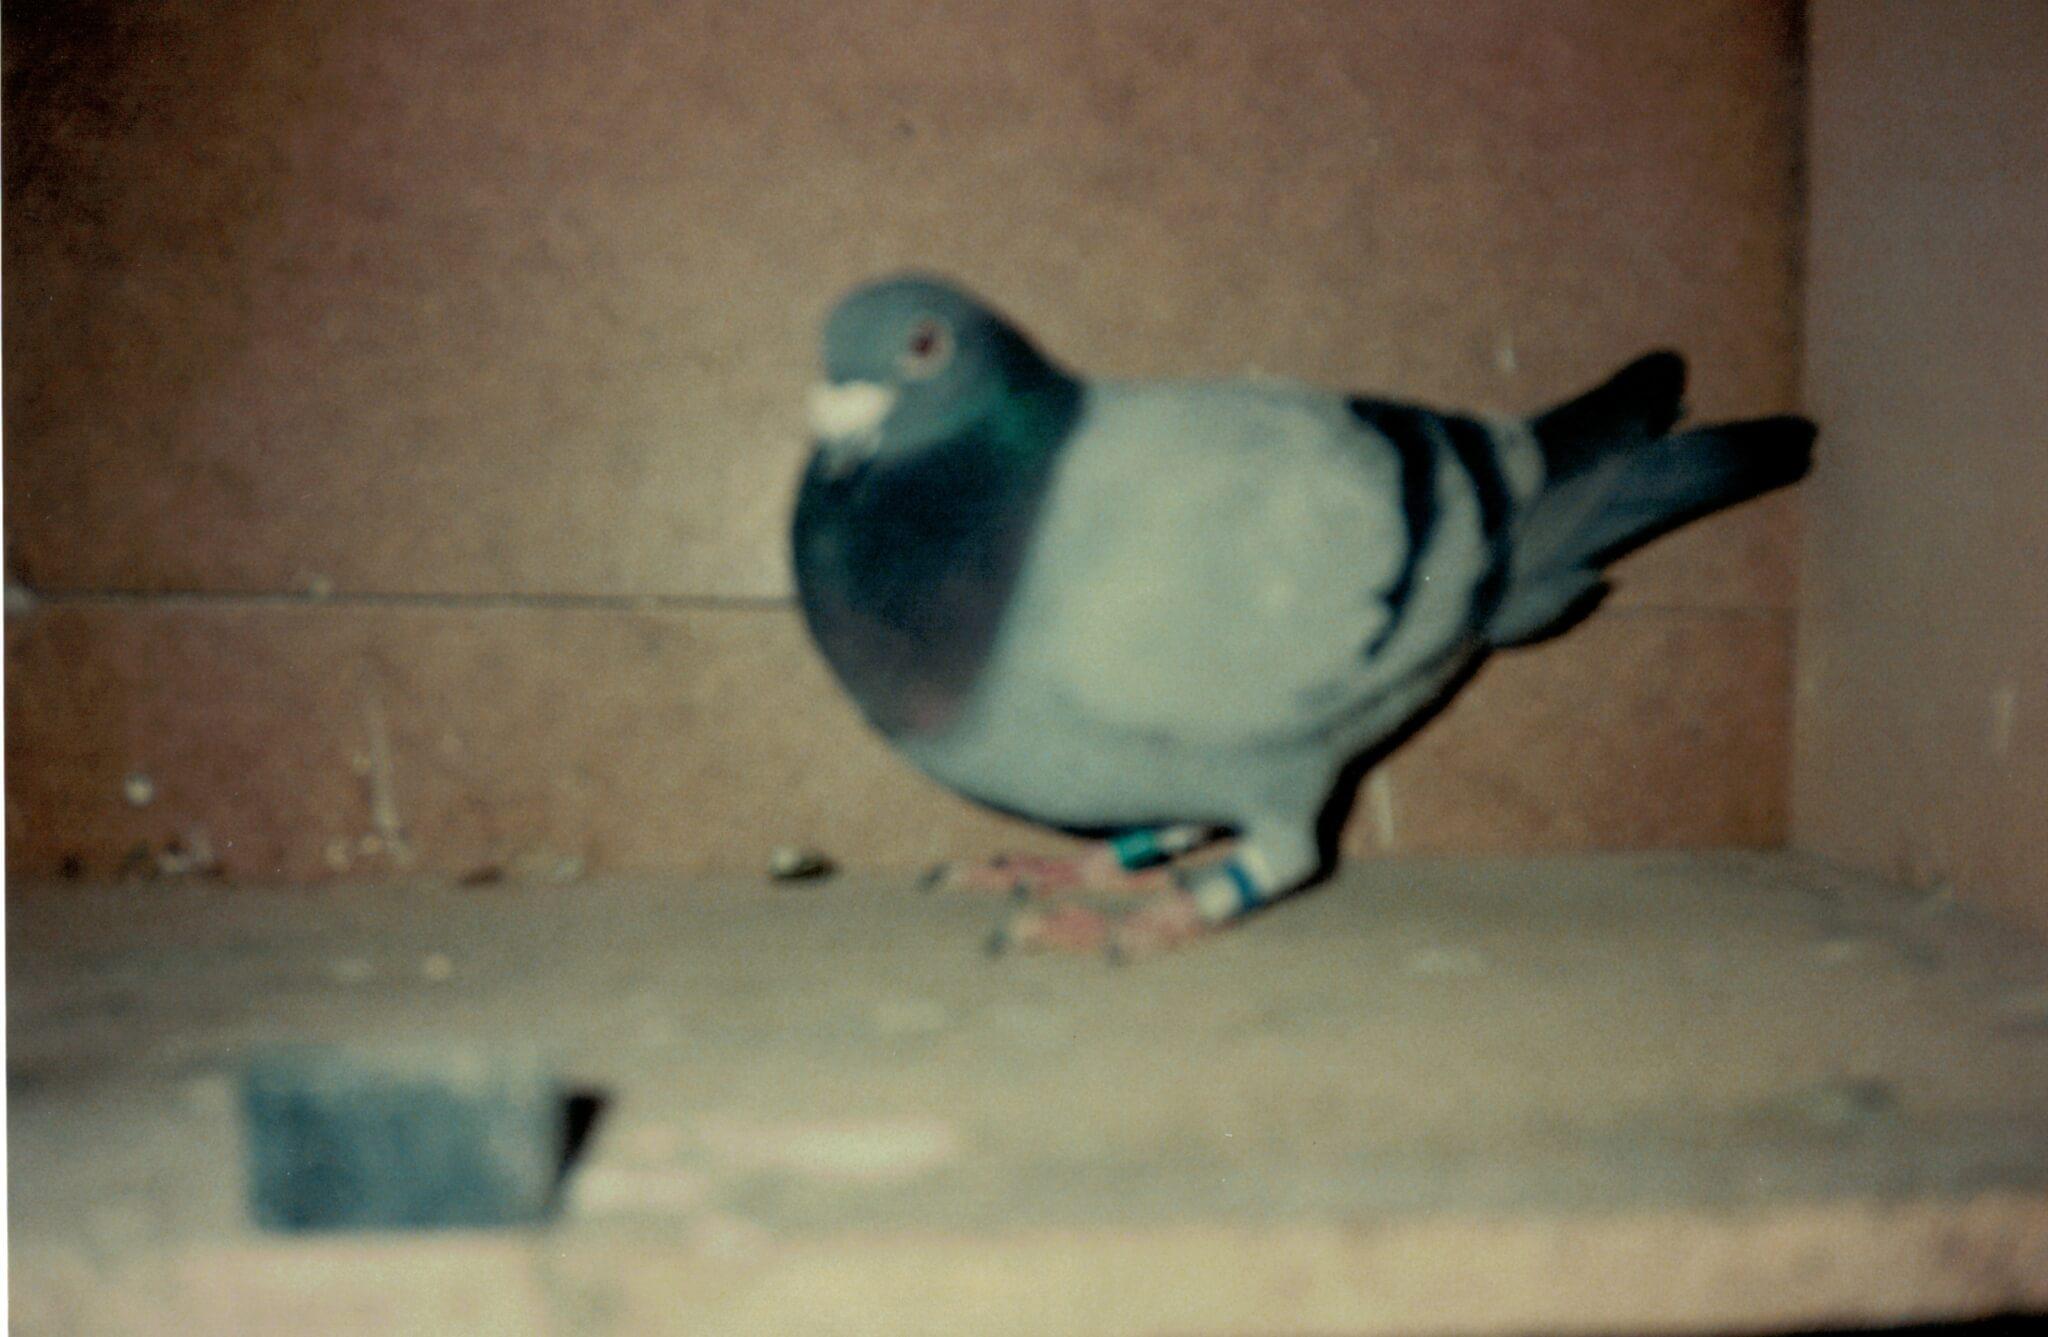 Brøbech Racing Pigeon